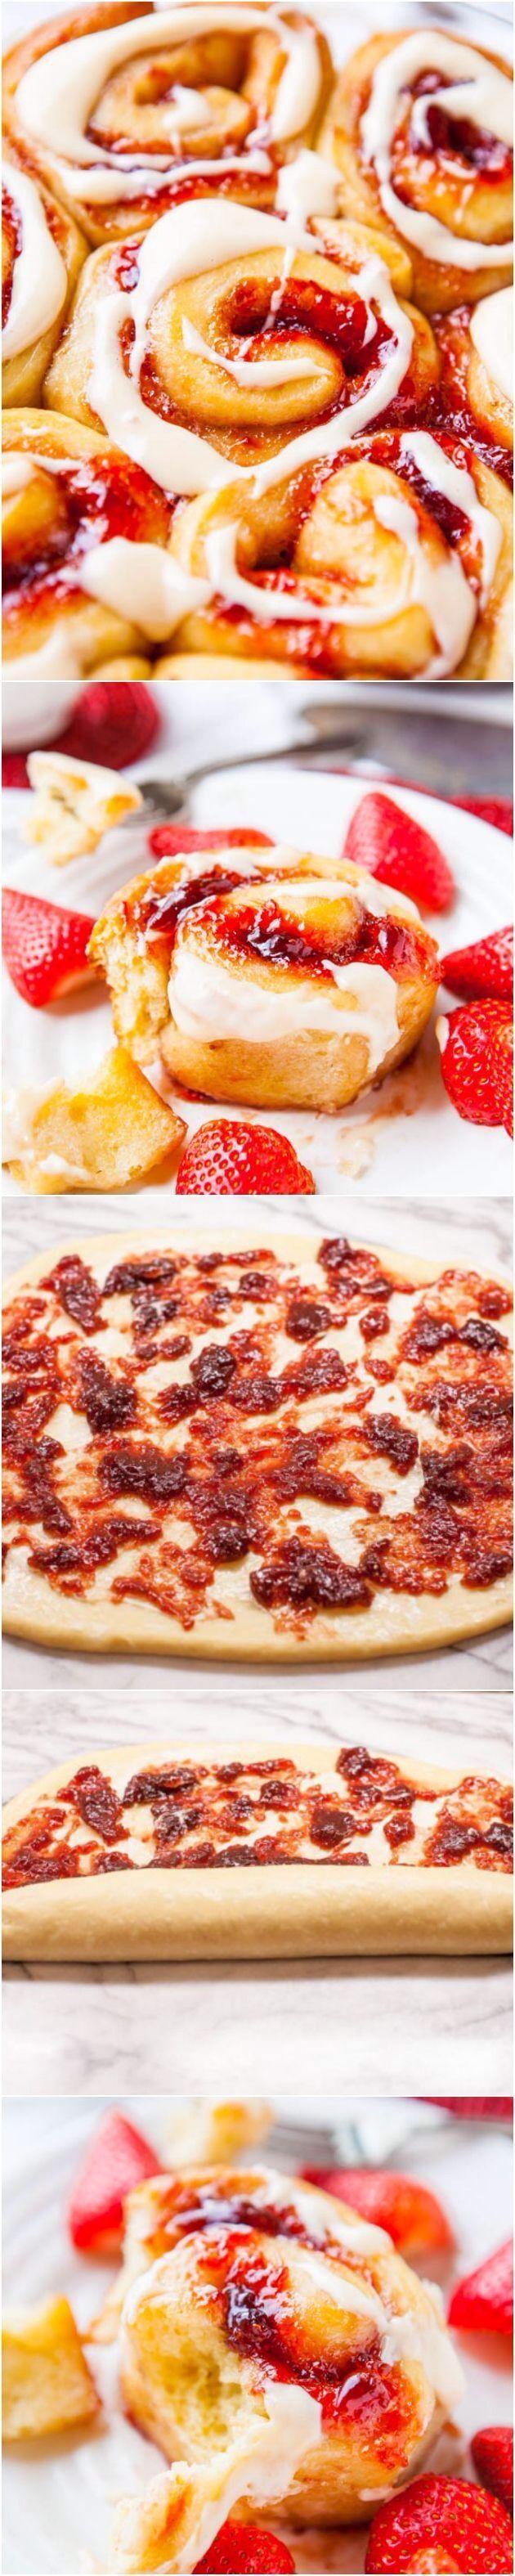 strawberry sweet rolls w/ vanilla cream cheese